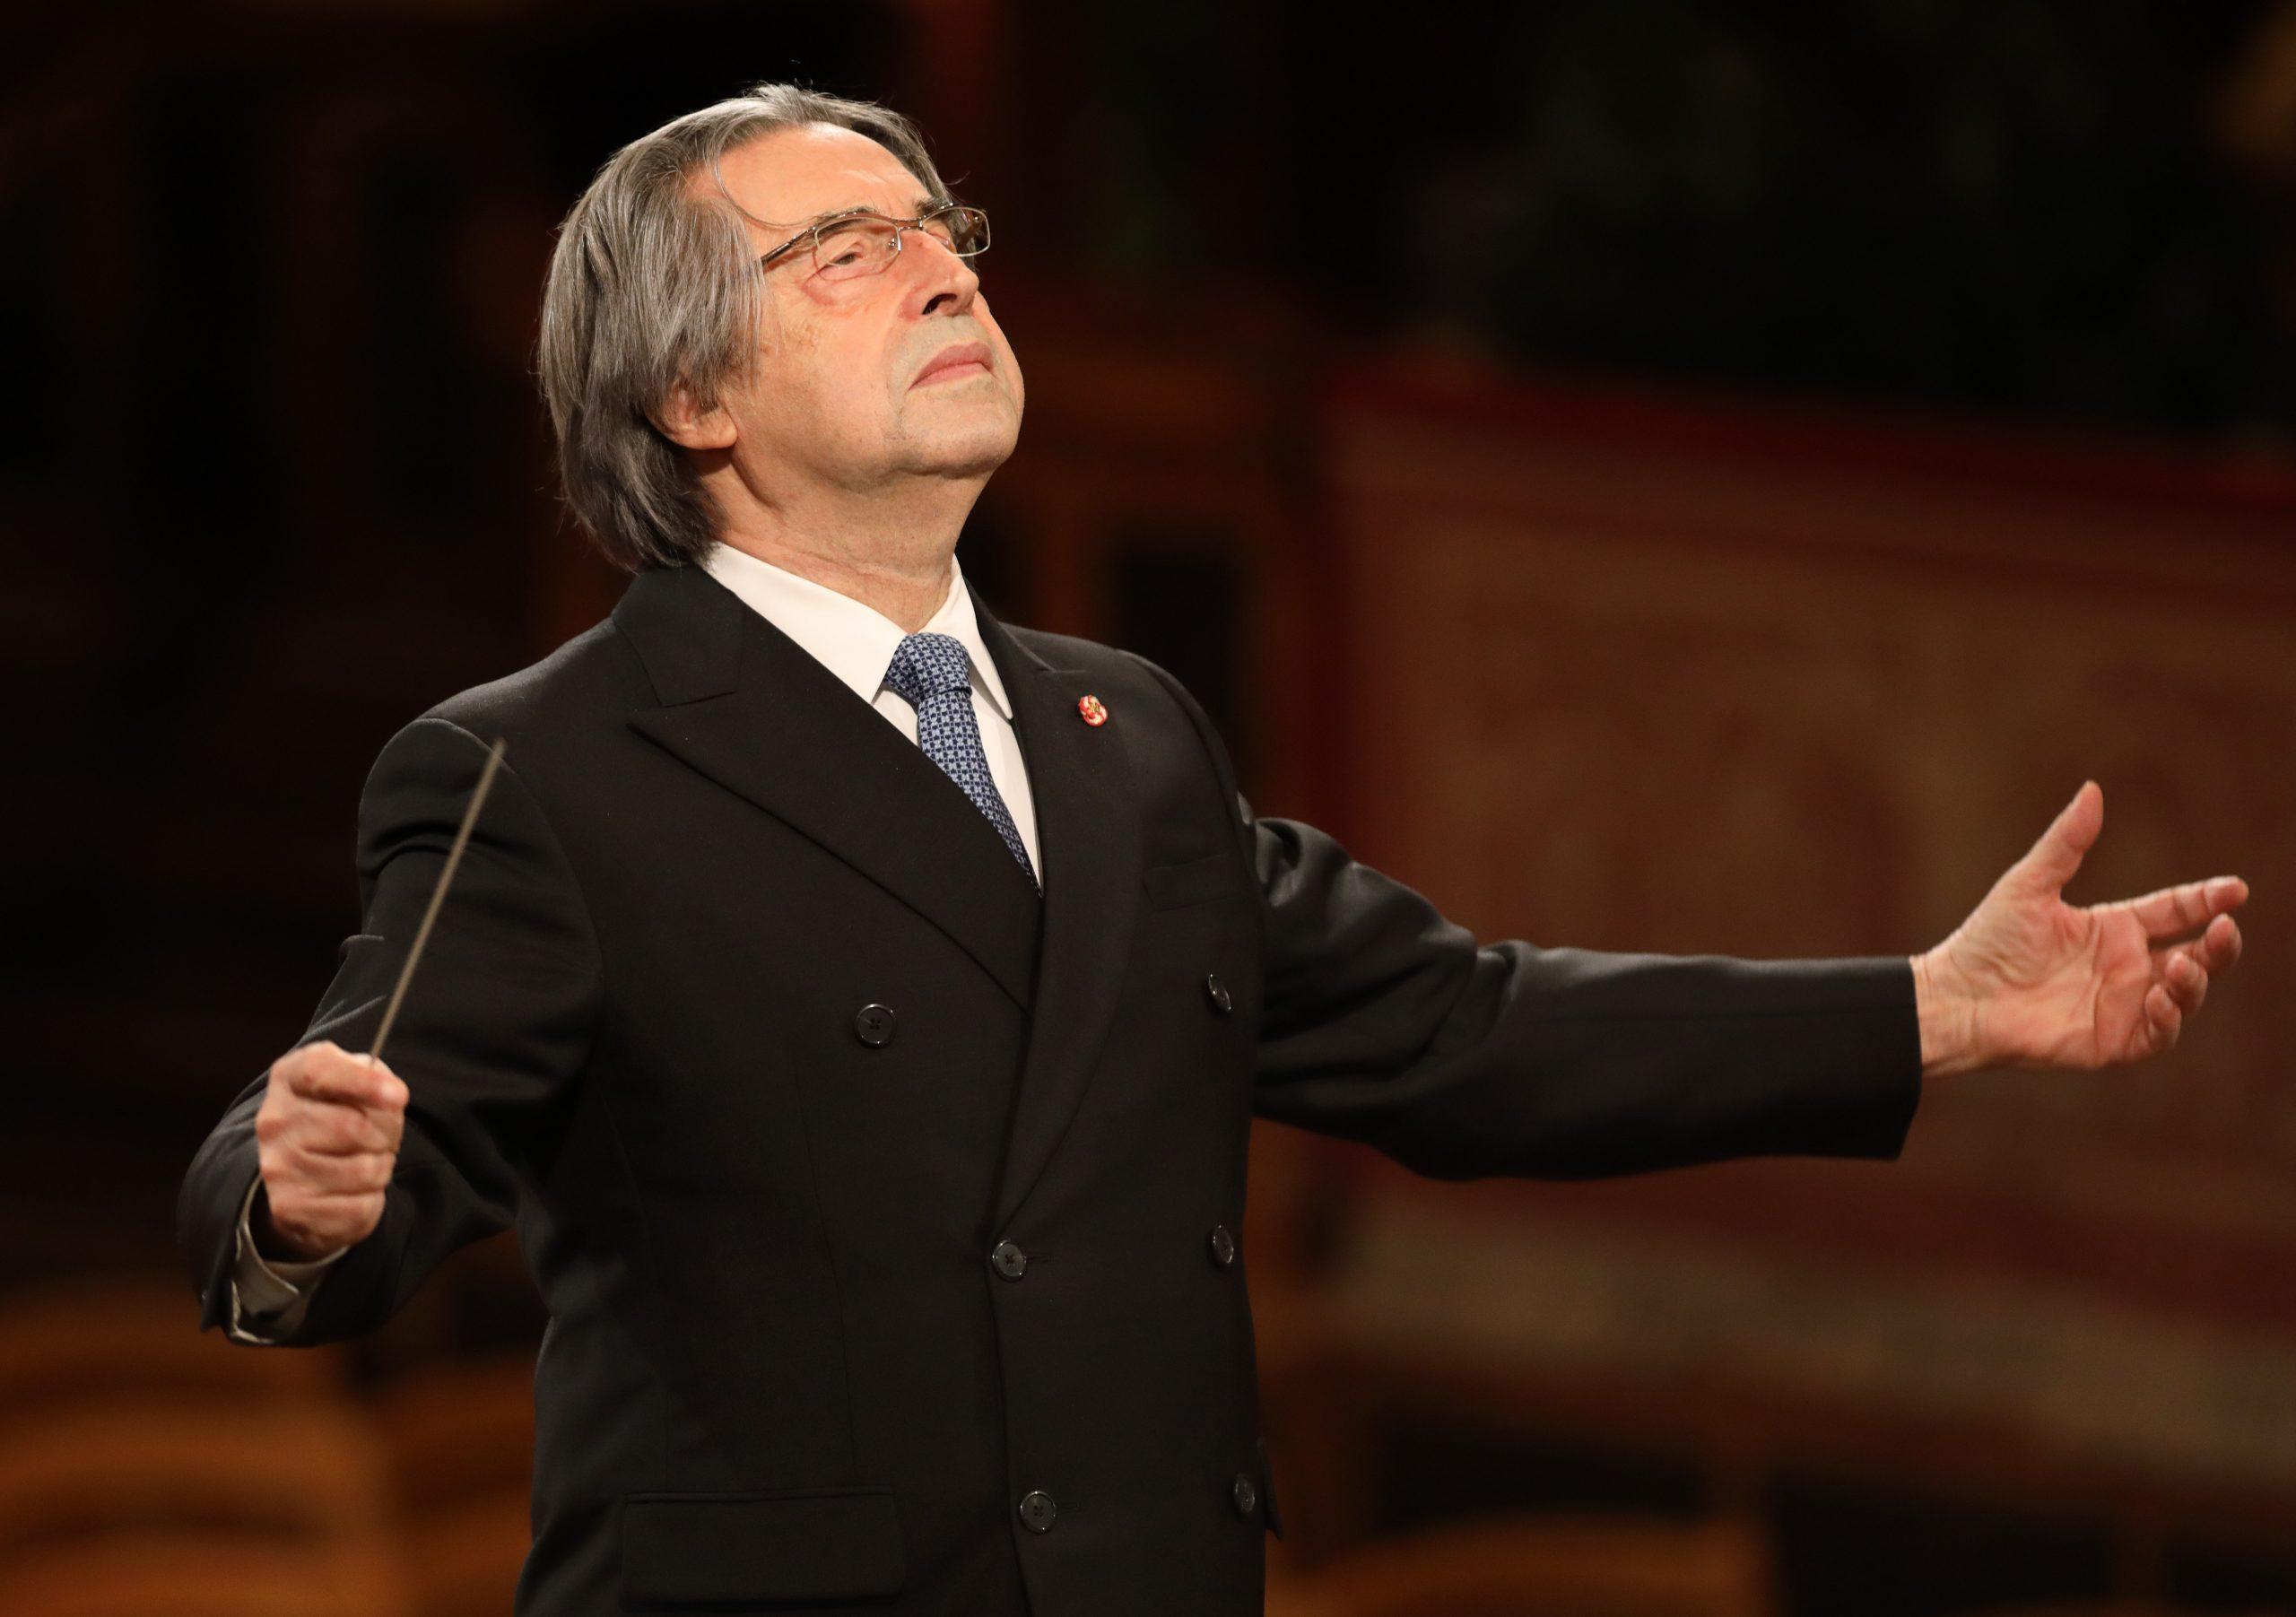 Riccardo Muti © Dieter Nagl